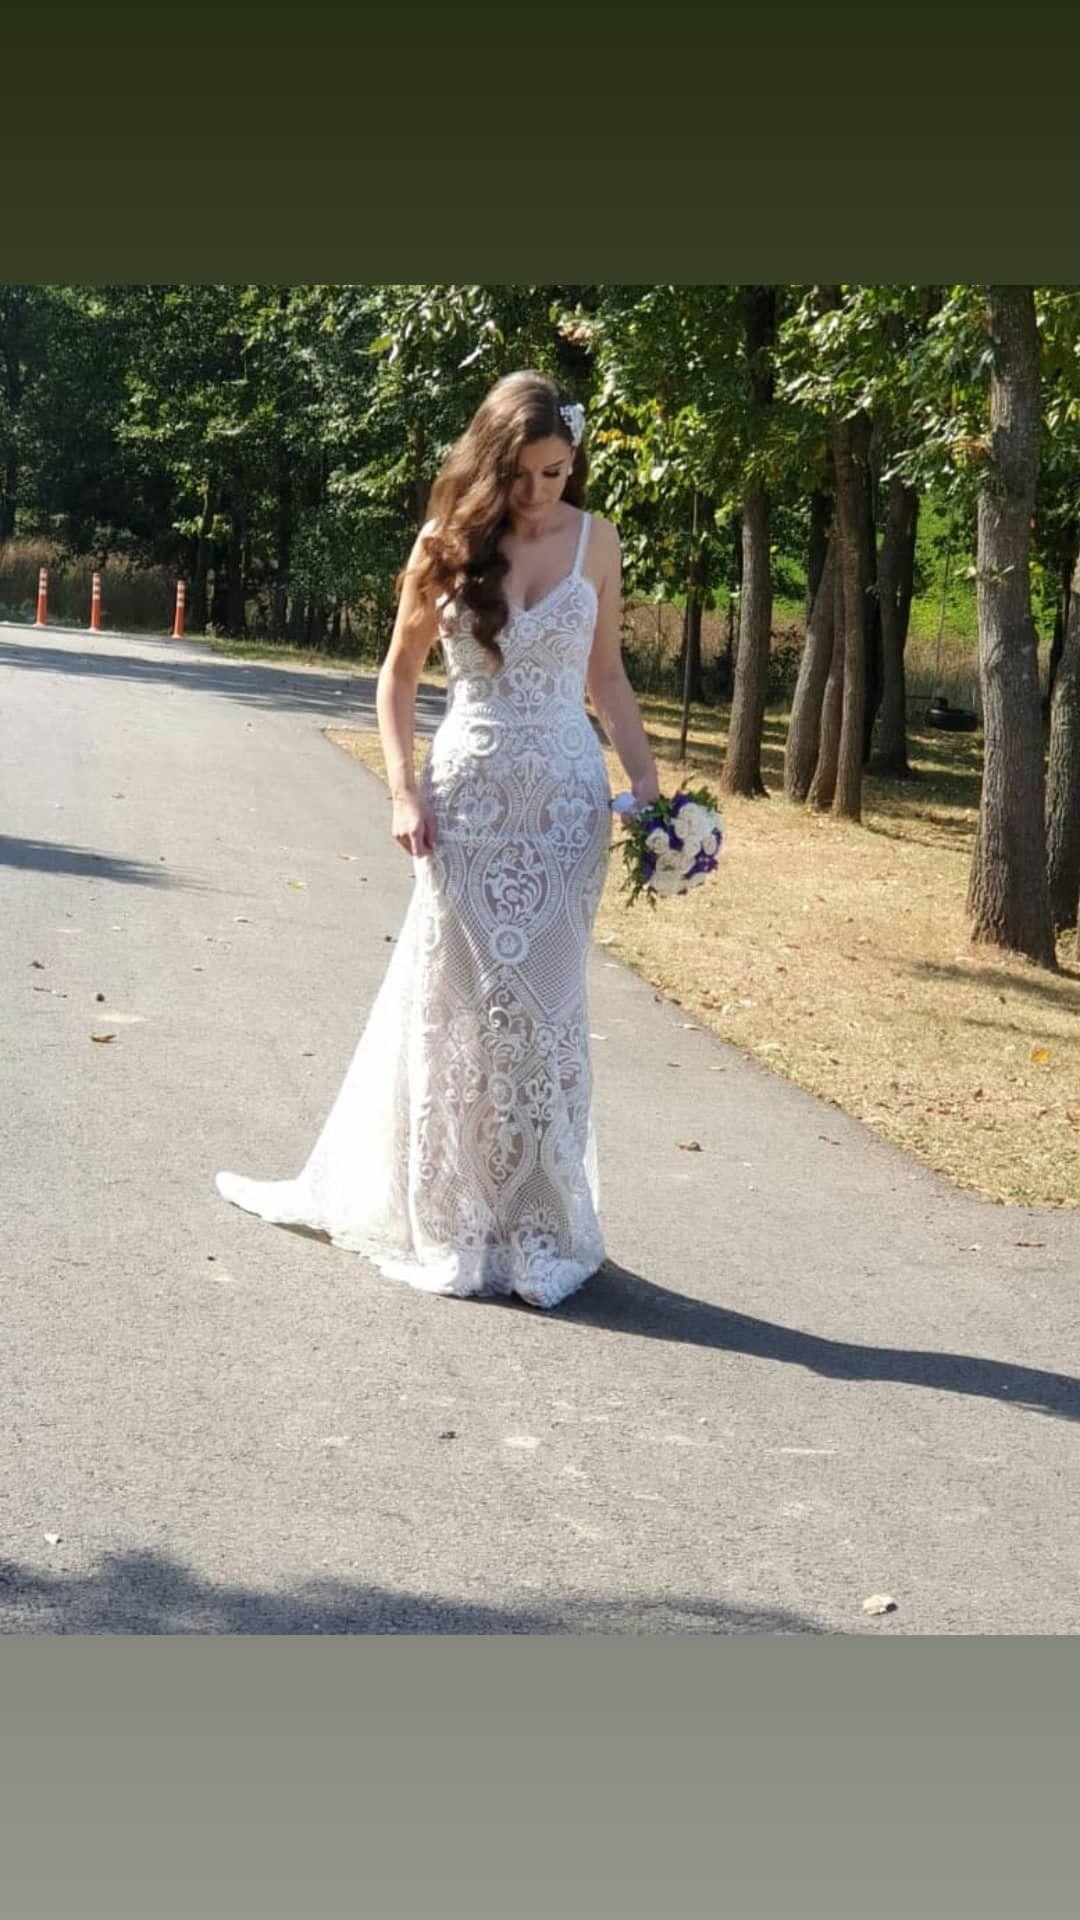 Pin By Lume Design On Lume Design Formal Dresses Wedding Dresses